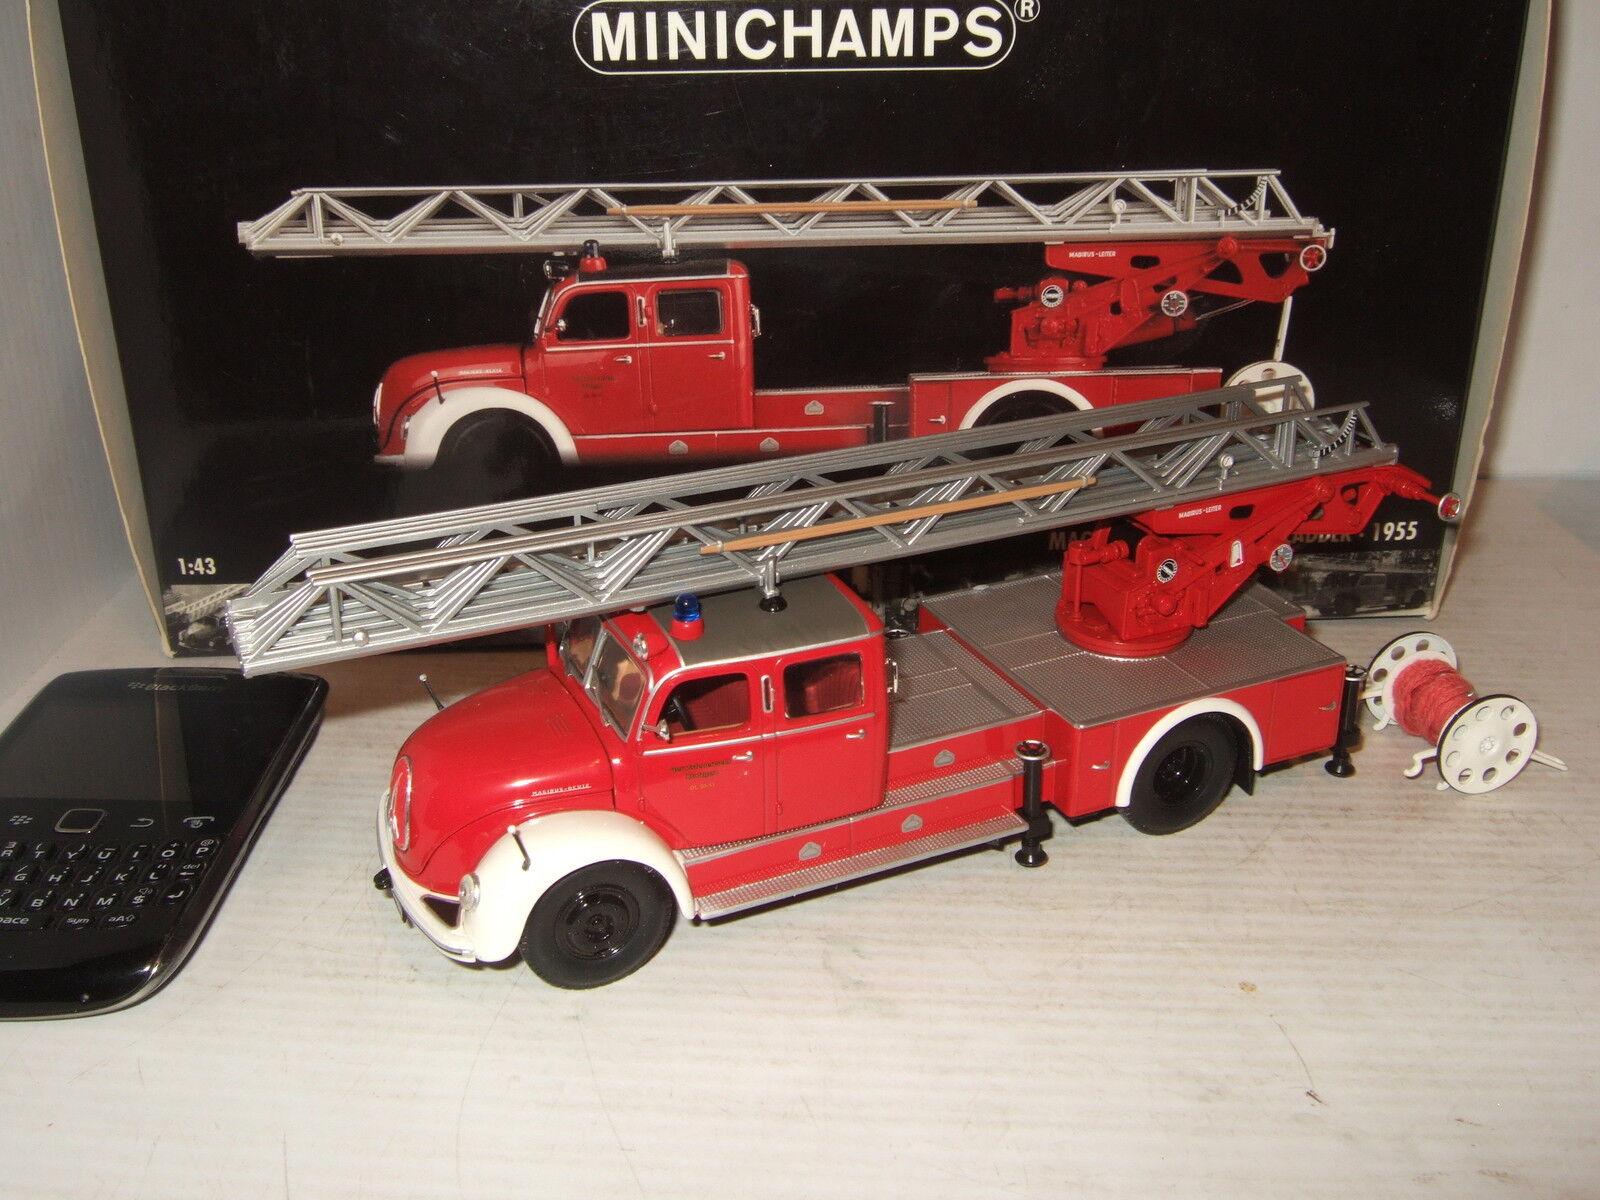 Minichamps 140071 Raro 1955 Magirus S 6500 Aerial Ladder en 1 43 Escala.